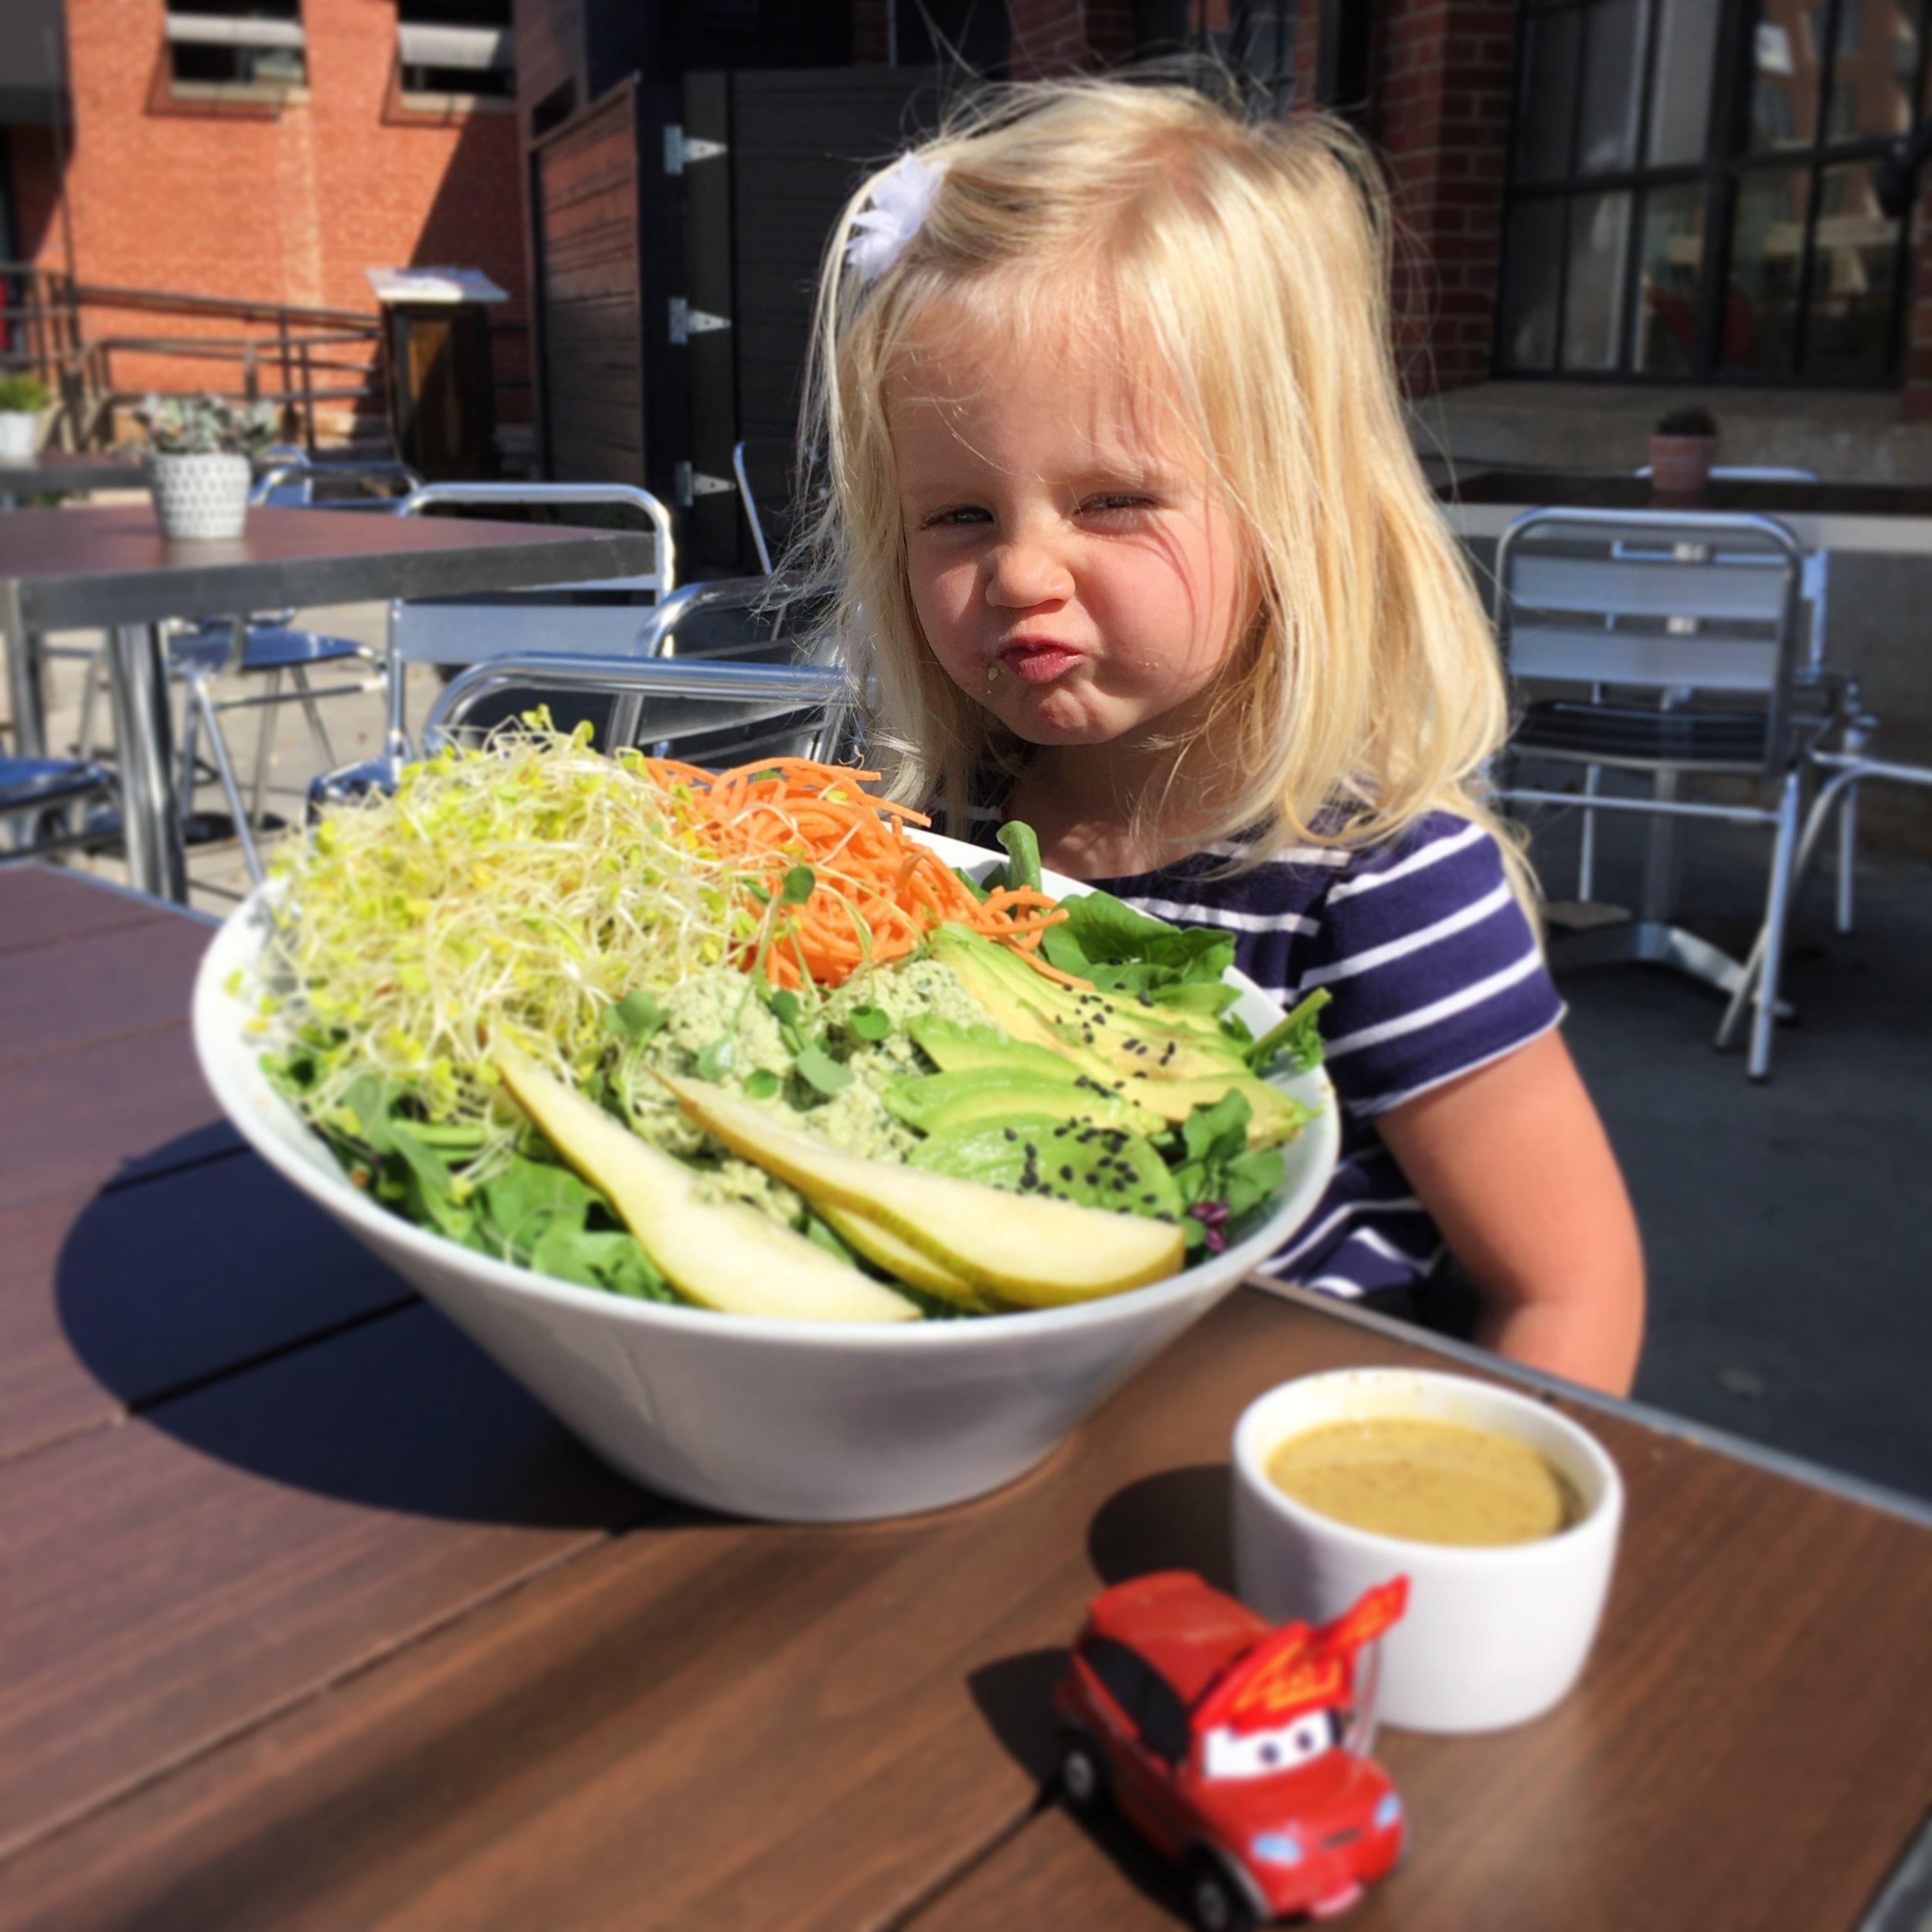 Always stealing Mommy's food #minime @livingkitchen Charlotte Arugula Harvest Salad